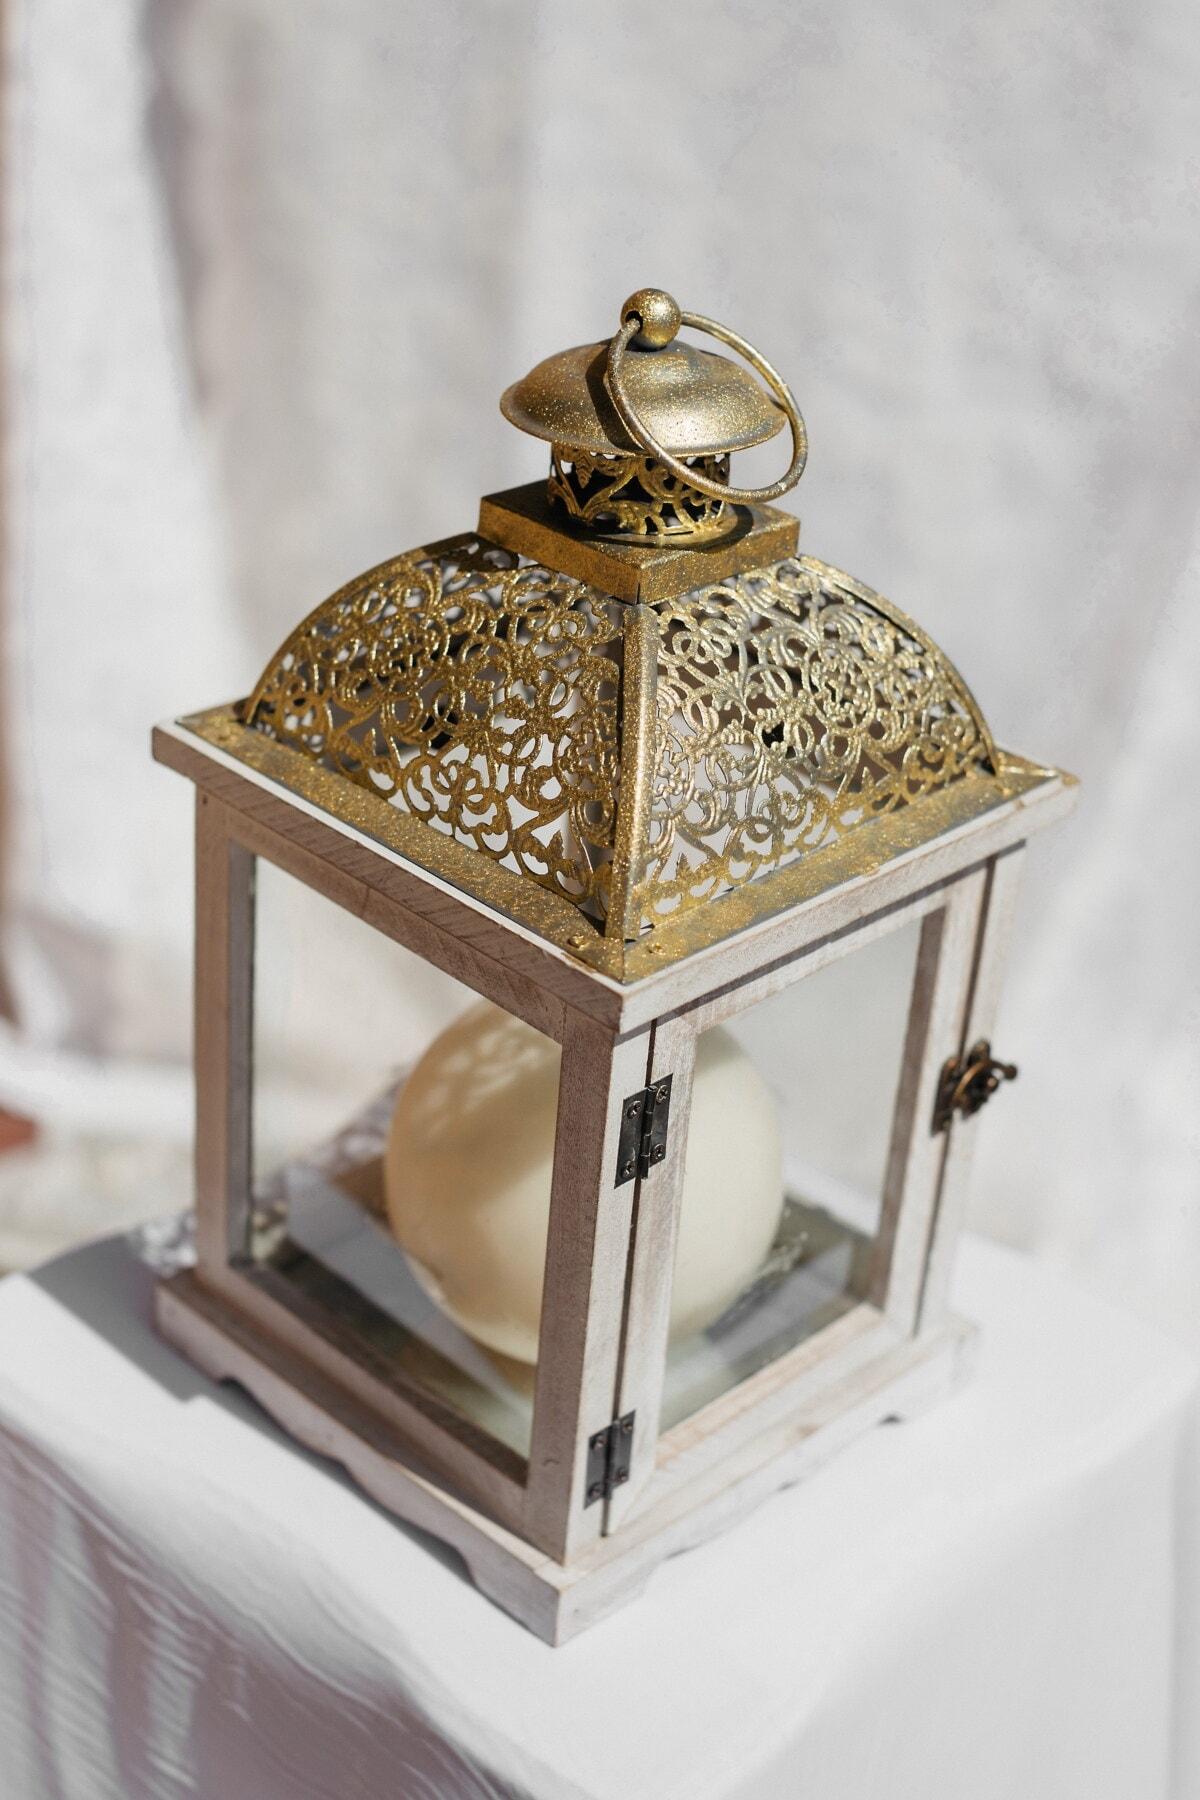 vintage, lantern, golden shine, antiquity, elegant, antique, interior design, traditional, wood, luxury